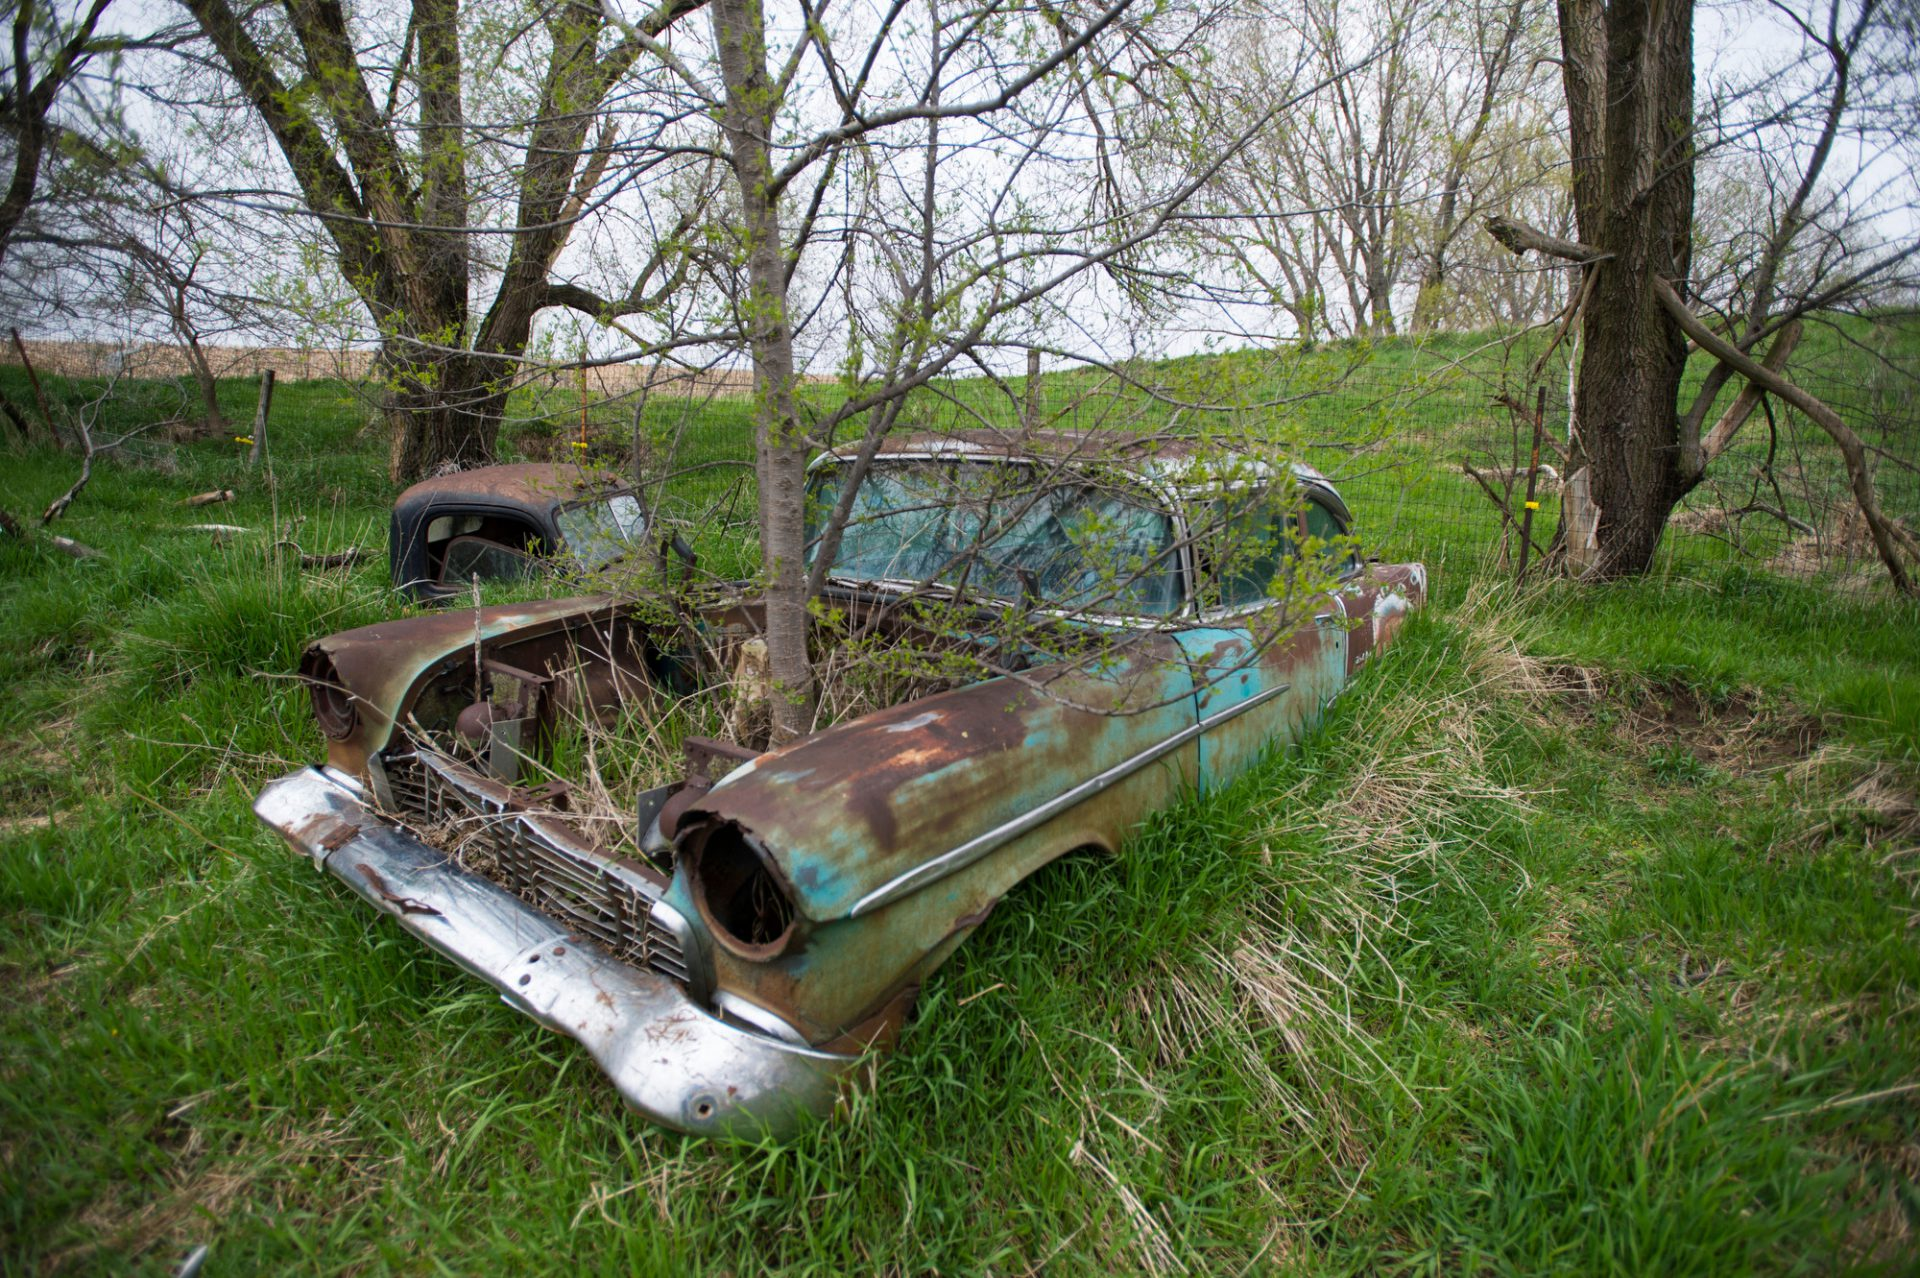 Photo: A tree growing through an old car.